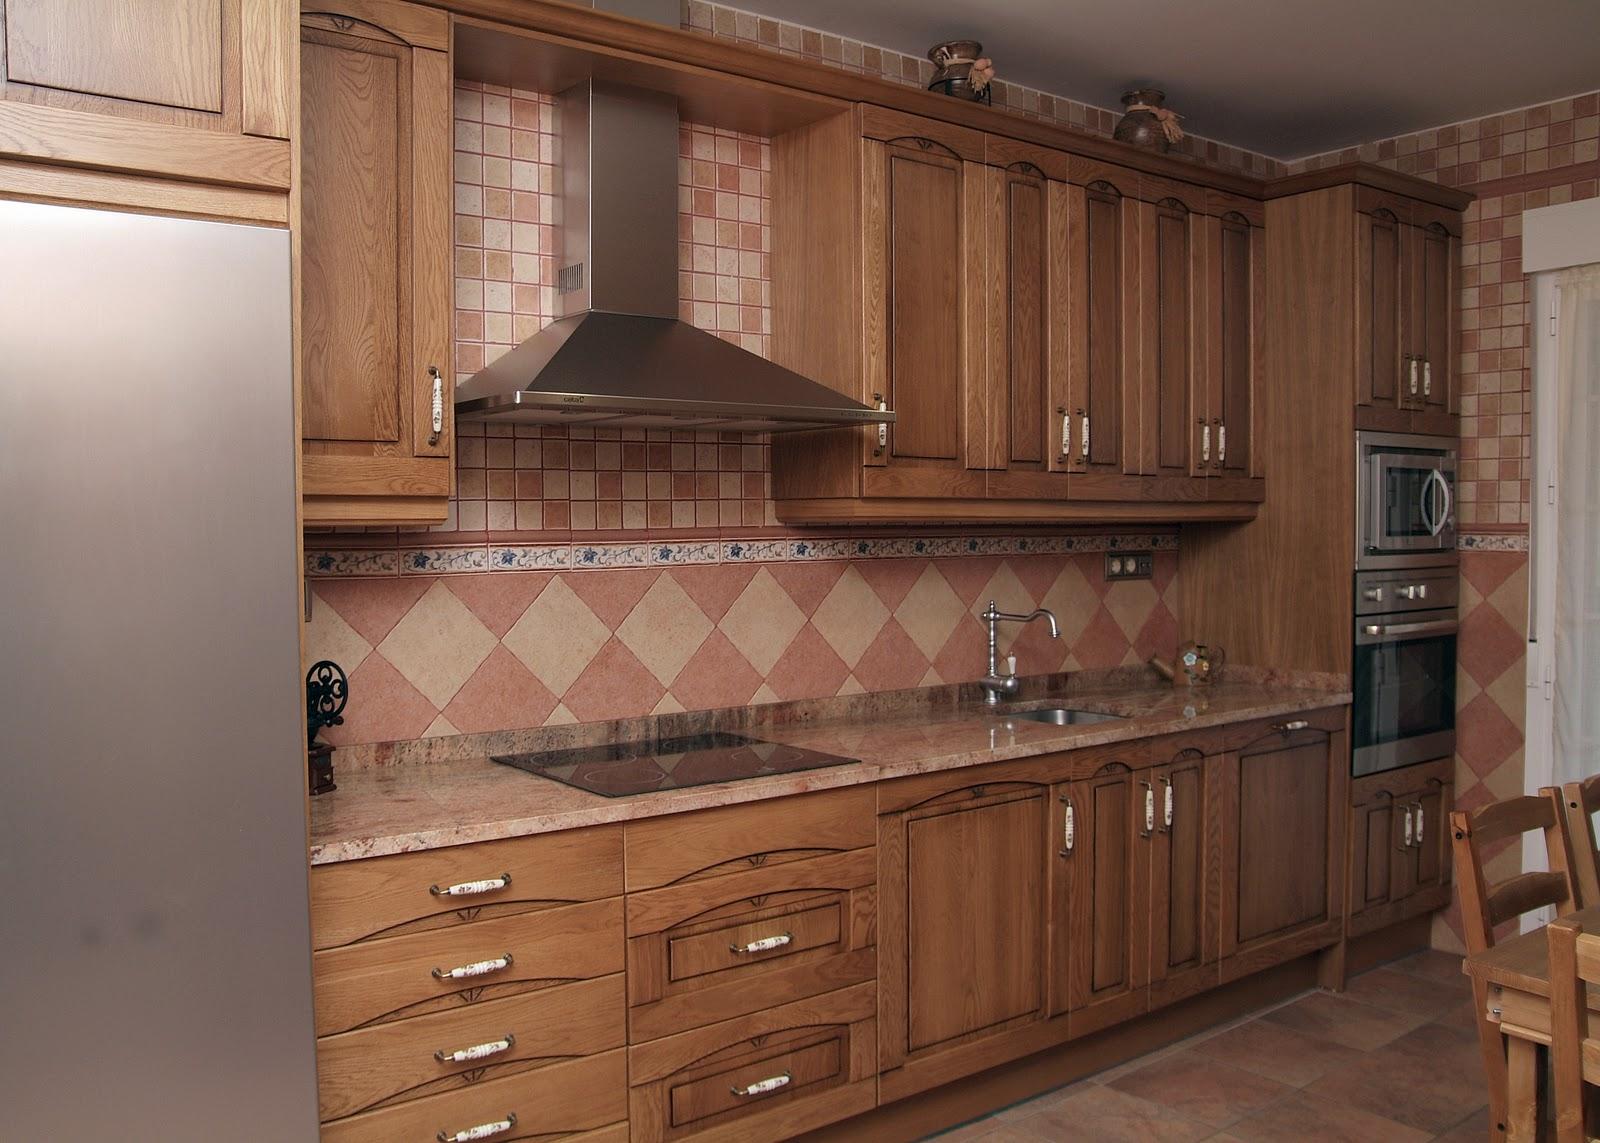 Cocisan cocina madera en roble tinte natural - Tiradores y pomos para muebles ...